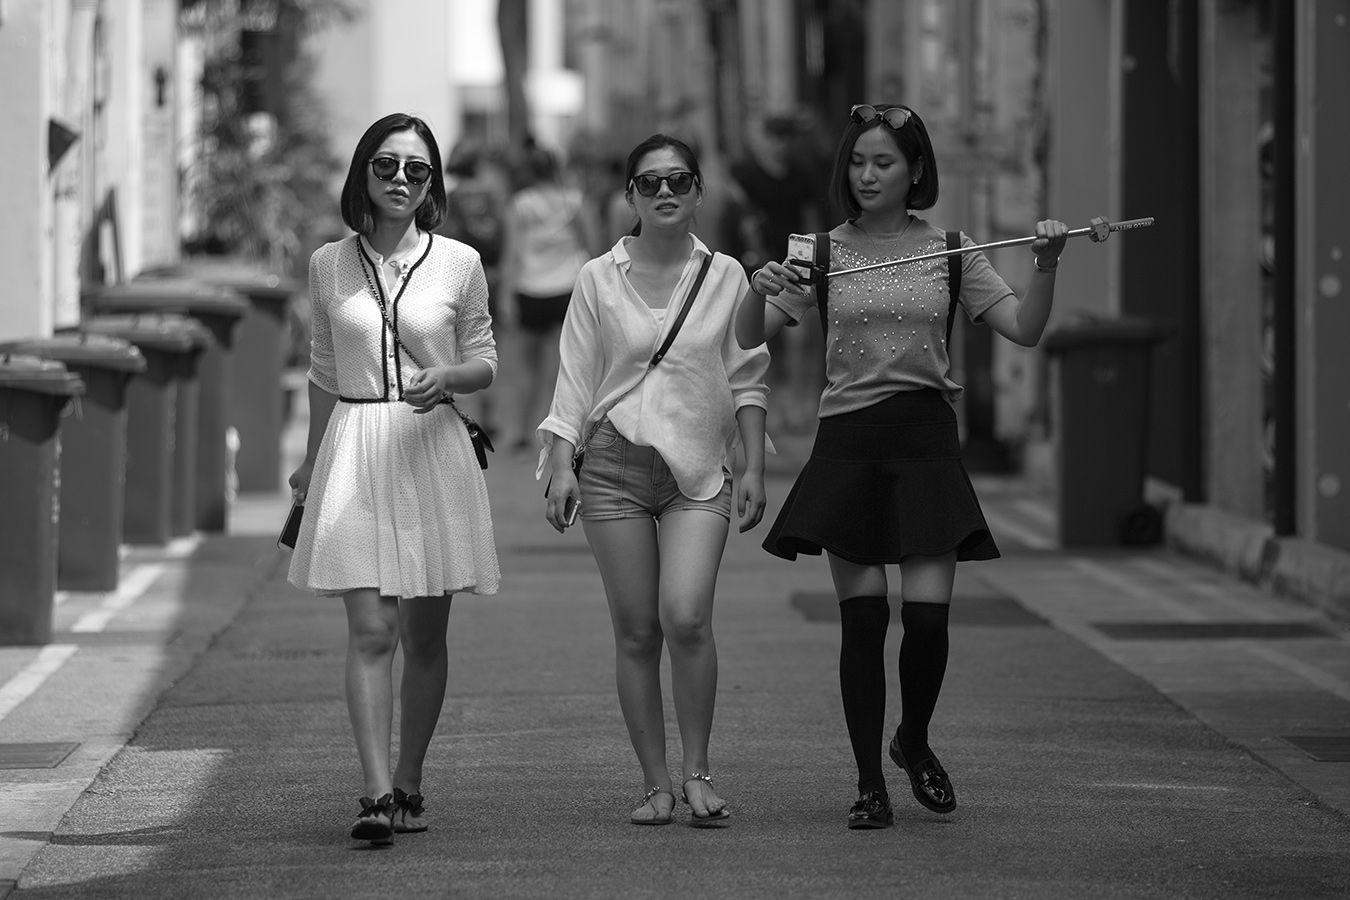 Они идут девушки